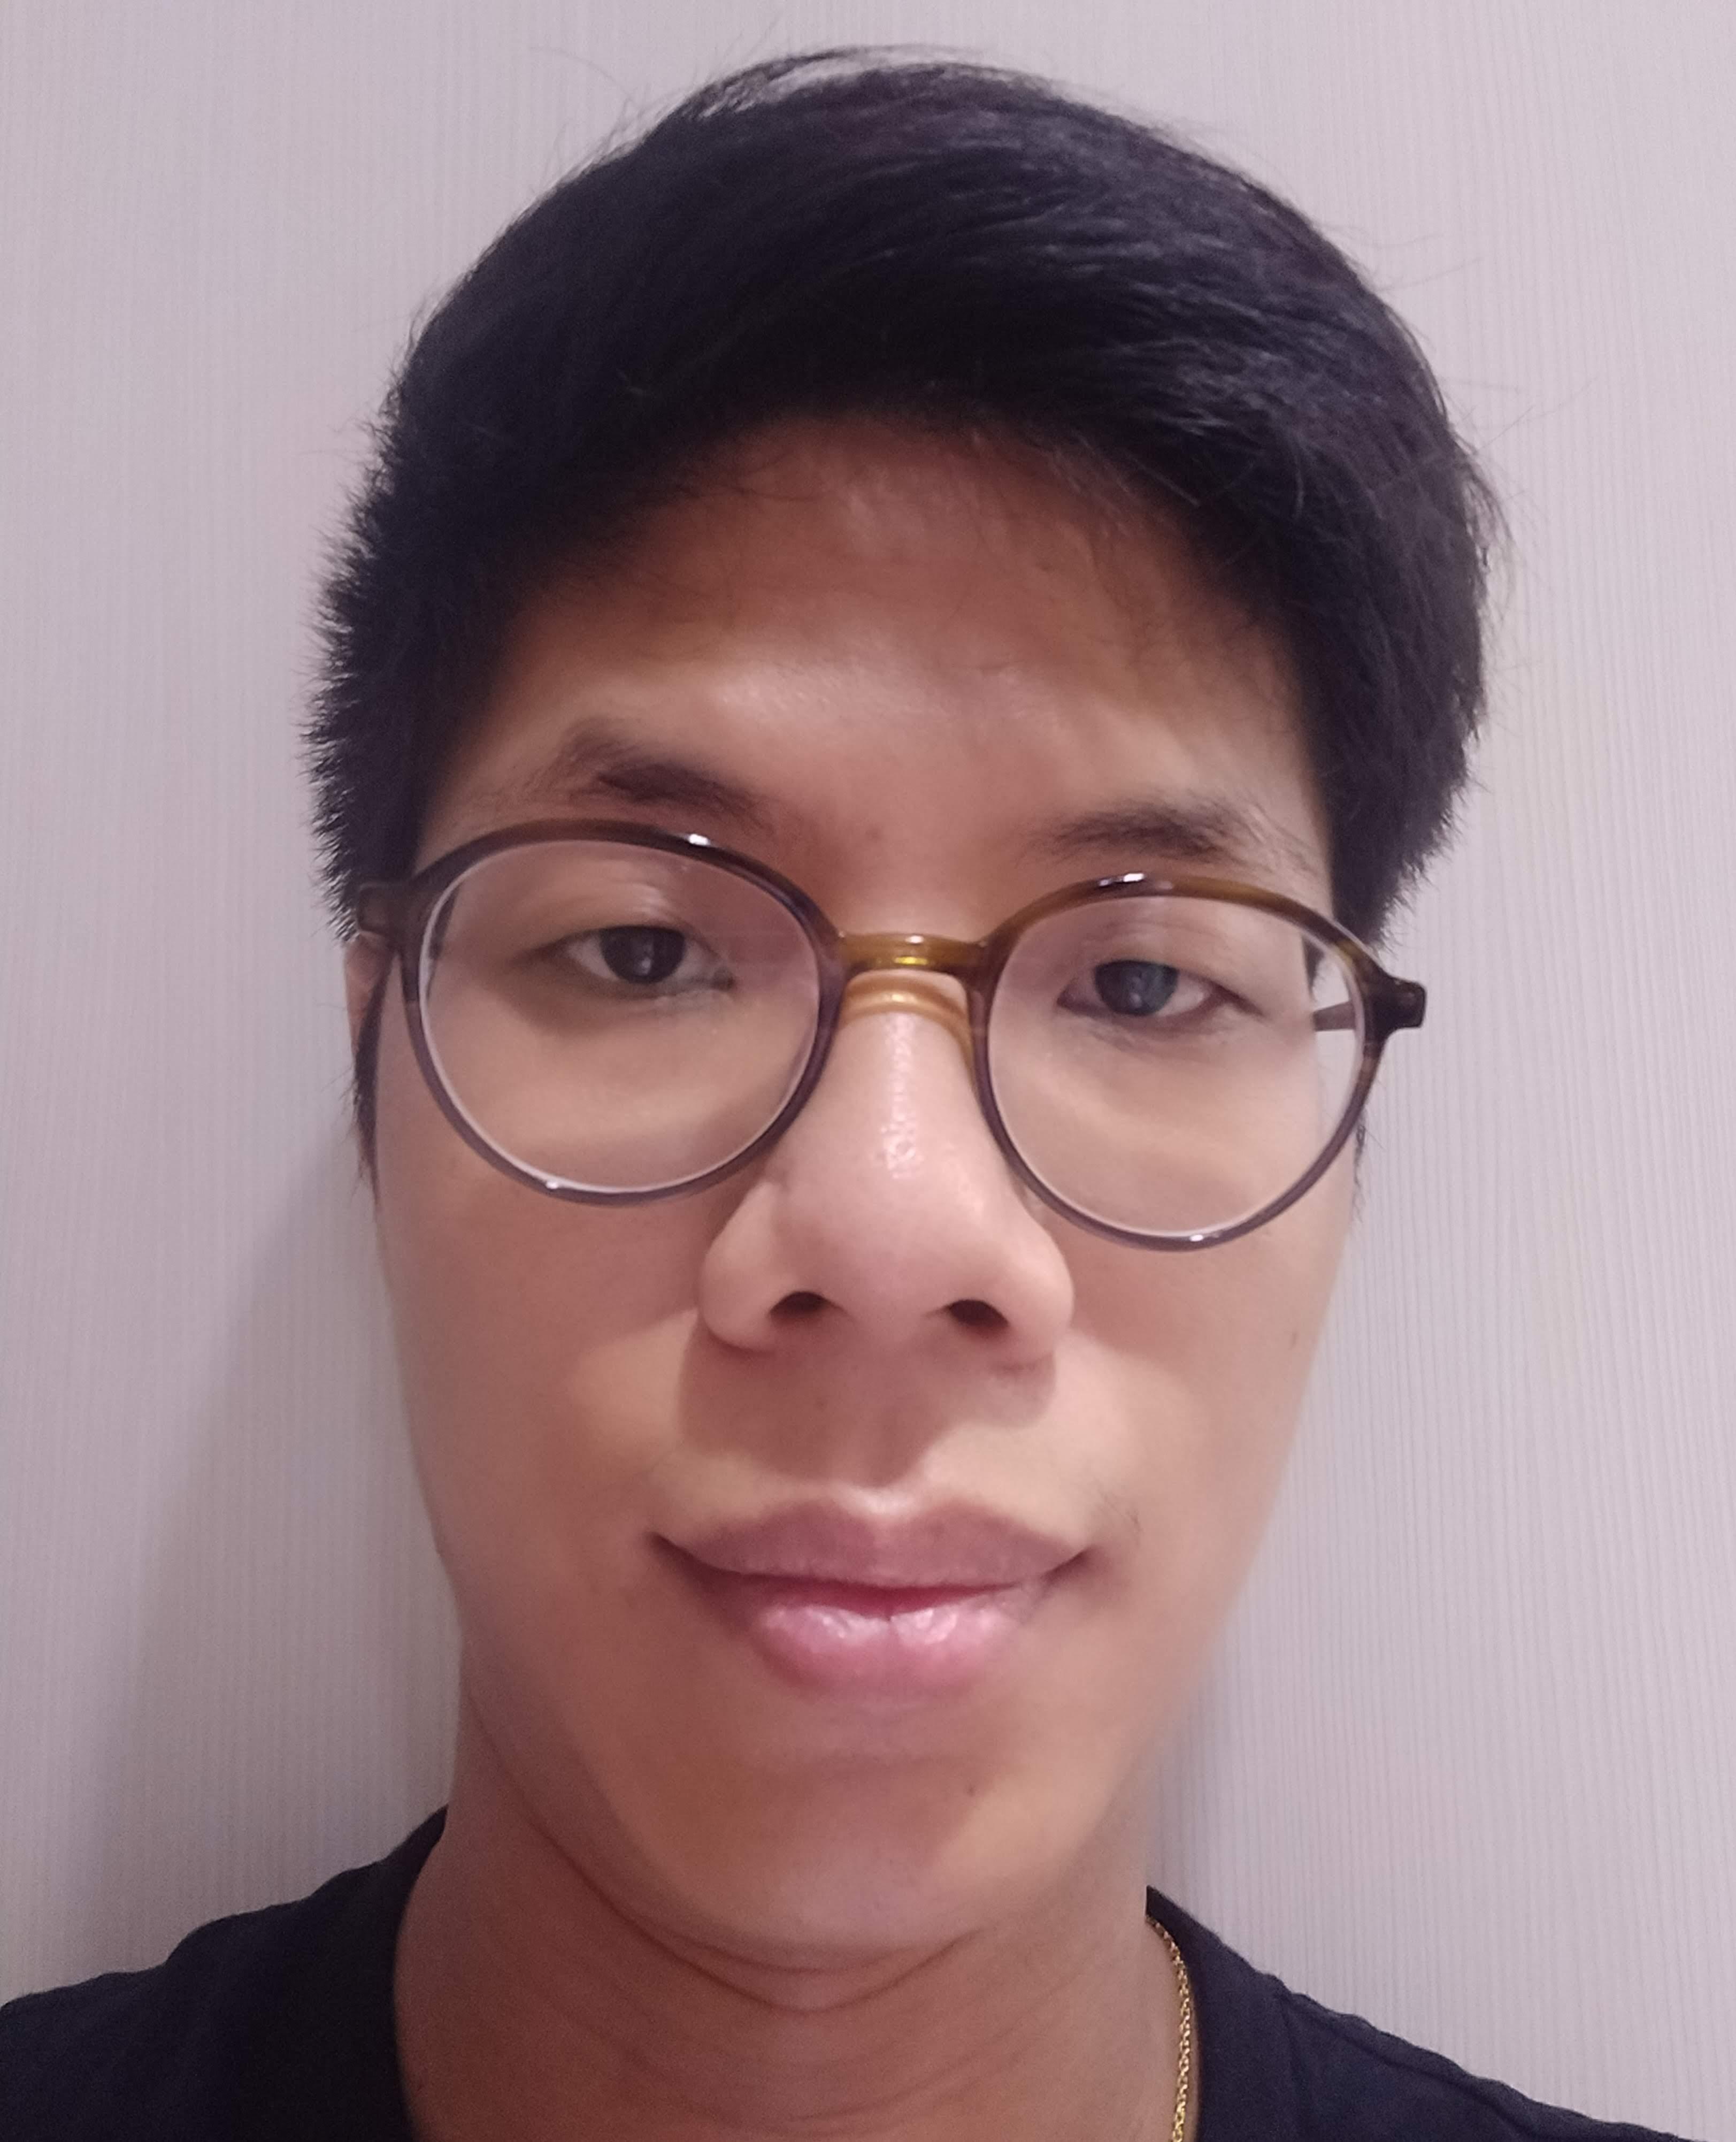 Teaching English and Living in Taiwan Tutors of Chinese Wanted  華語教學工作機會, Taoyuan, 1:1 Chinese Tutor Wanted  image